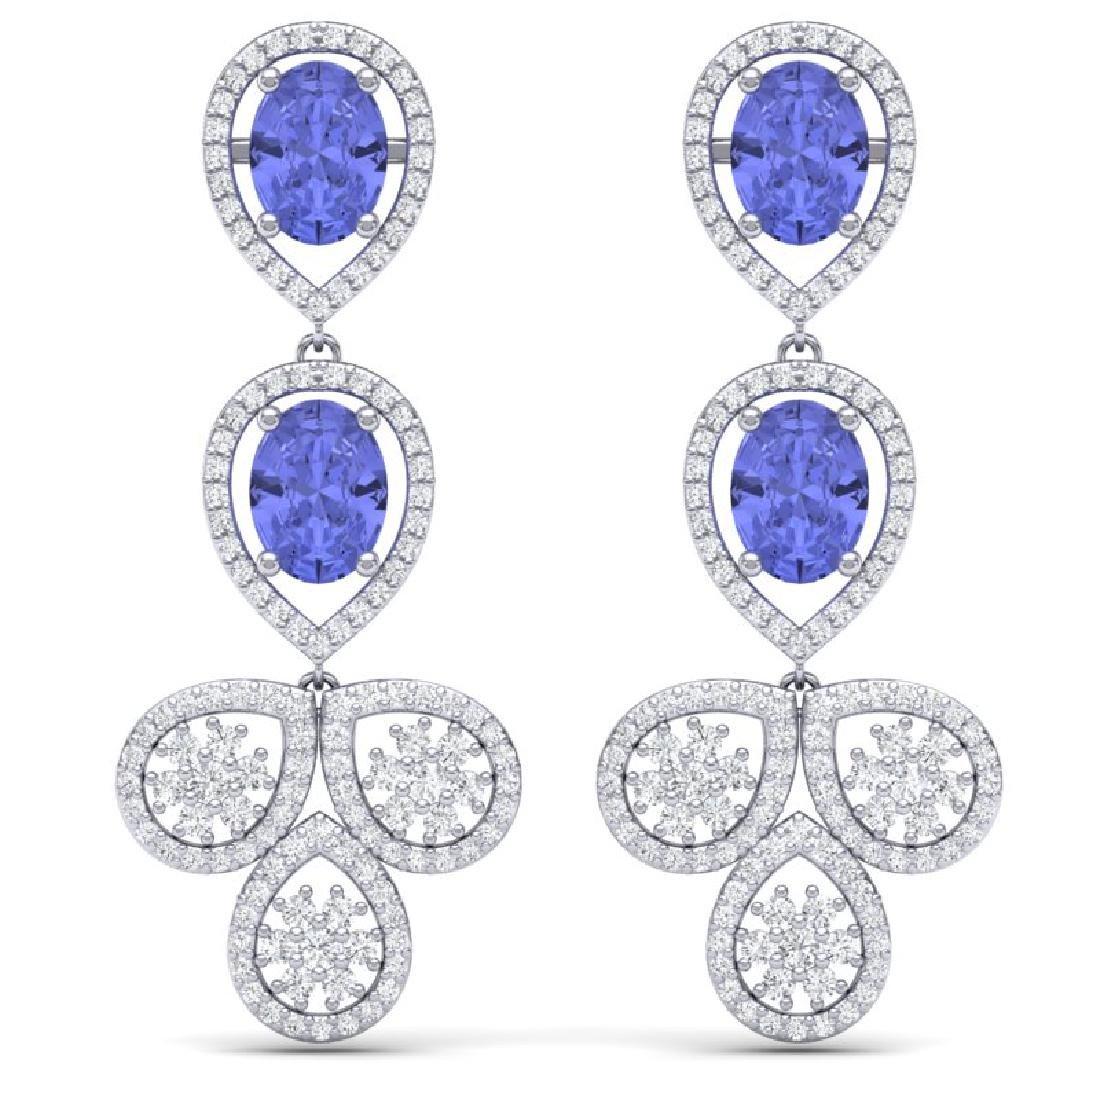 8.75 CTW Royalty Tanzanite & VS Diamond Earrings 18K